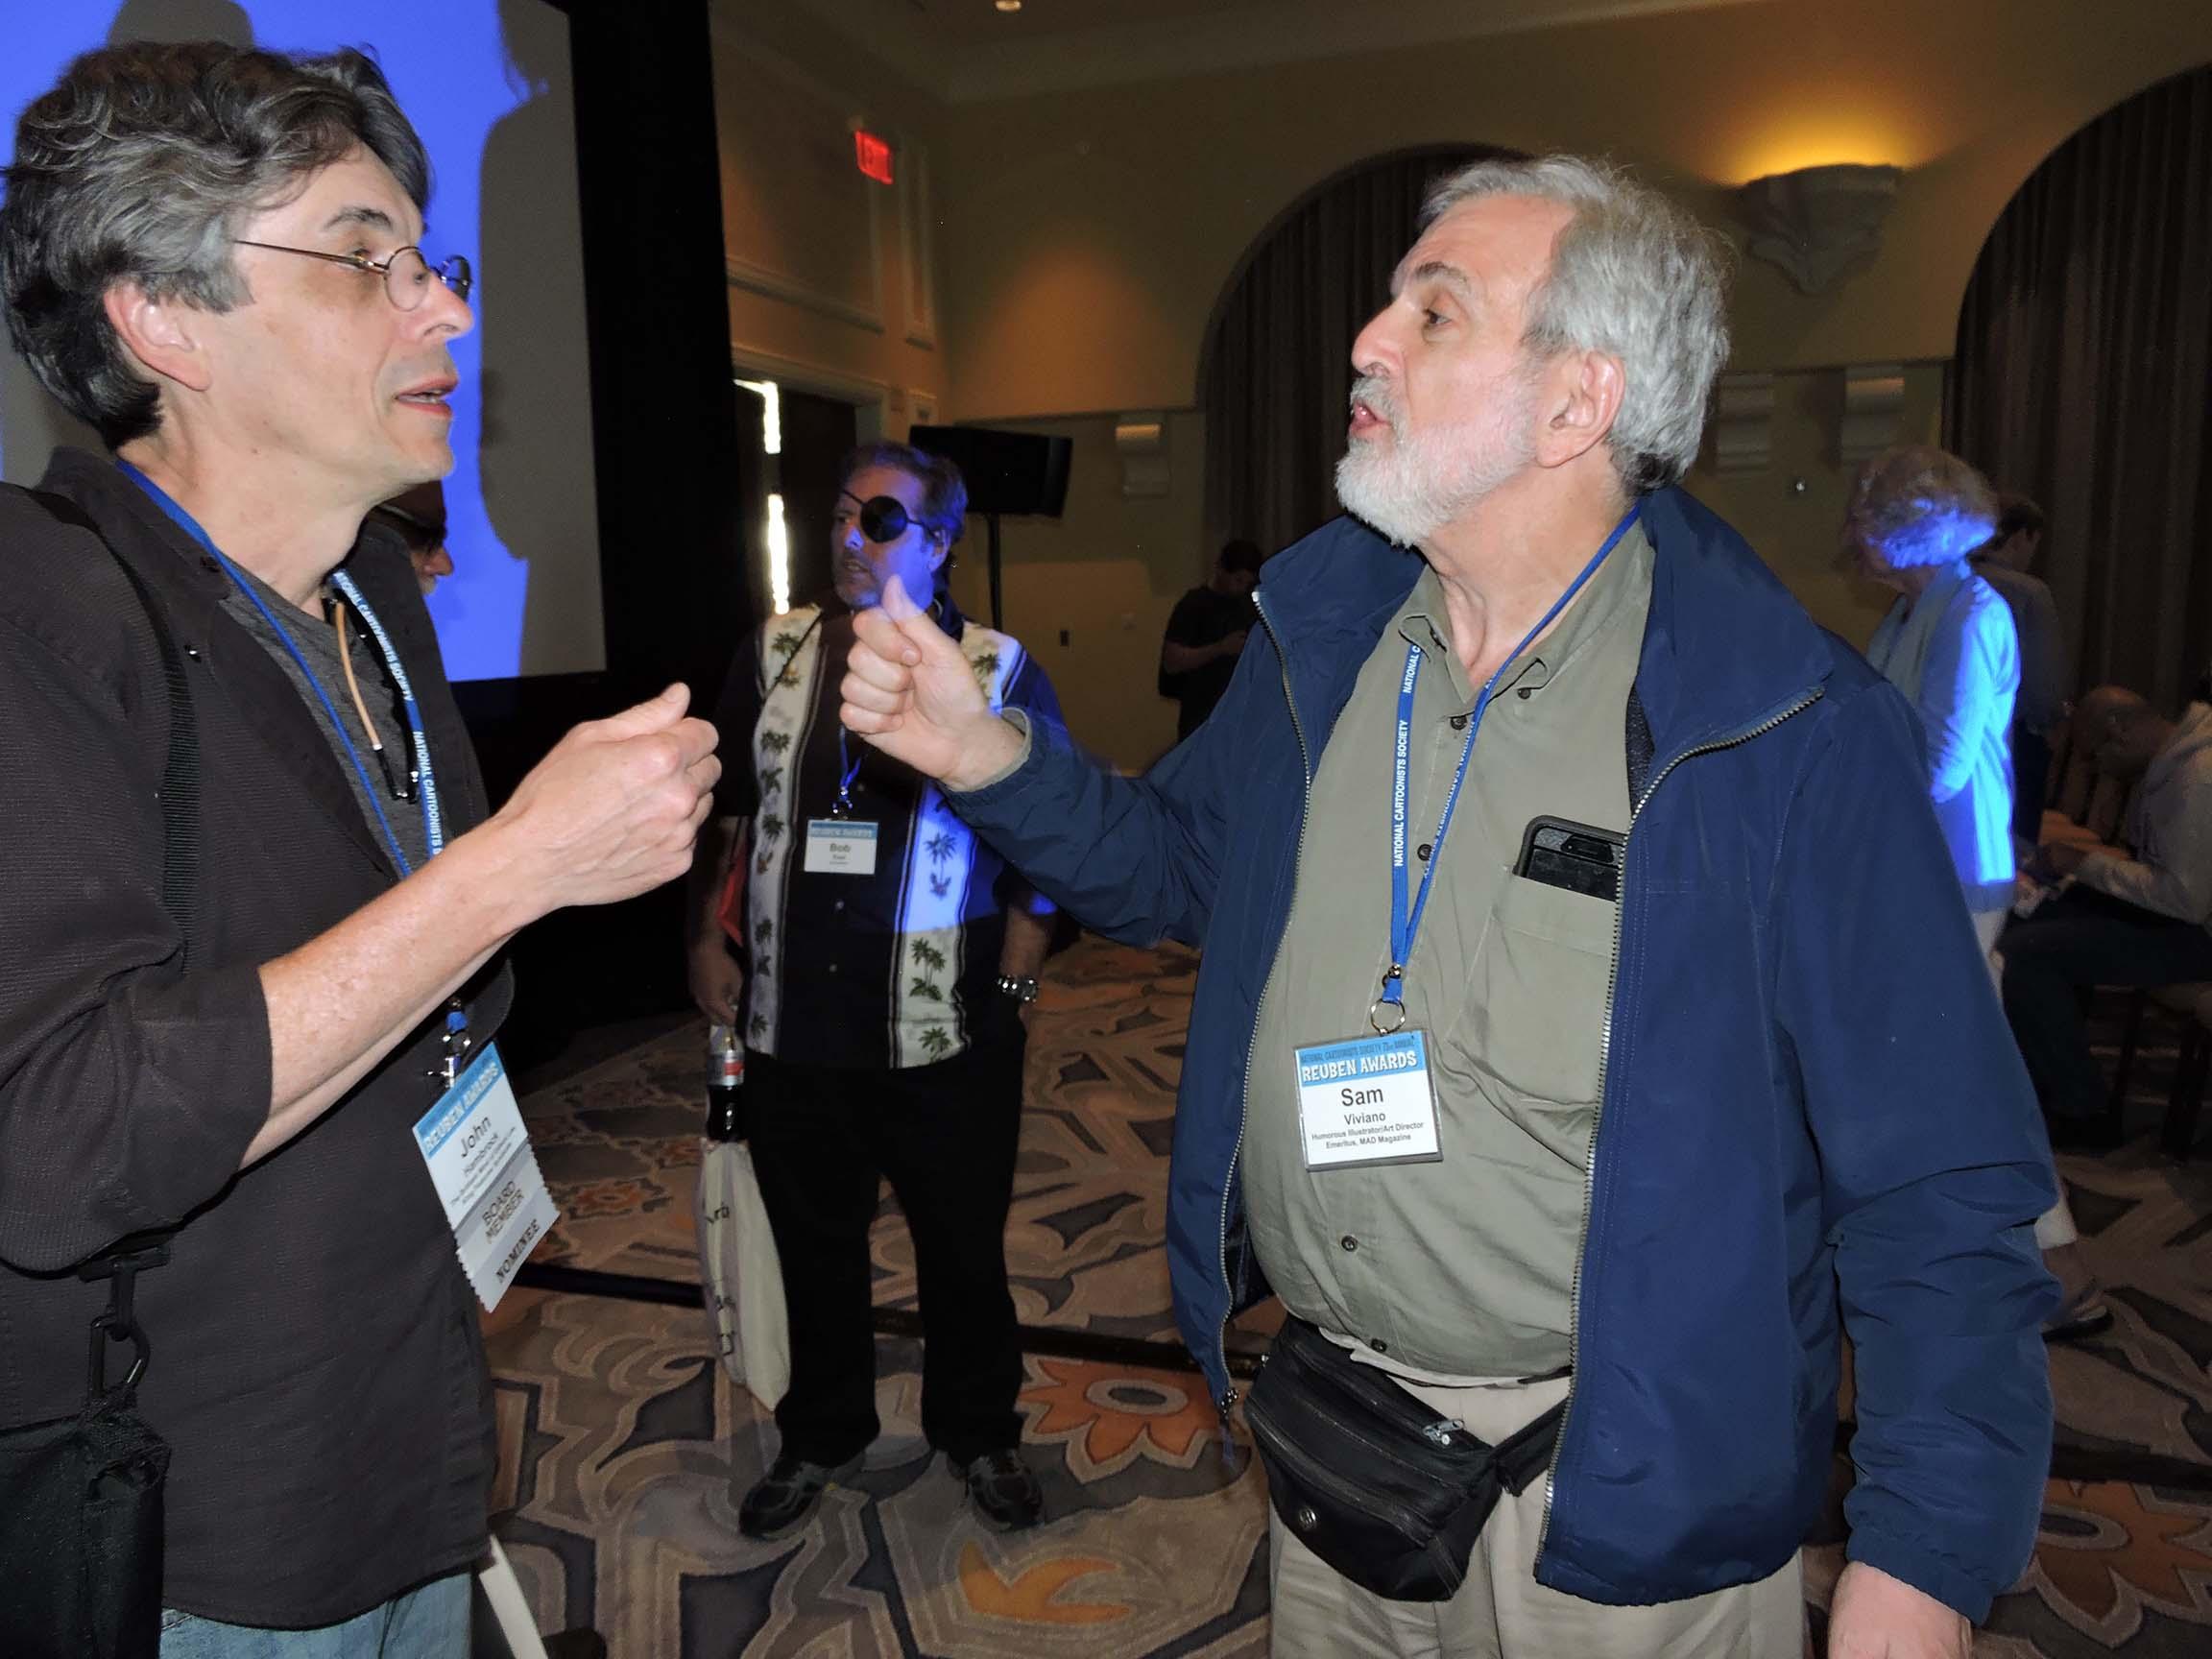 John Hambrock (left) and Sam Viviano